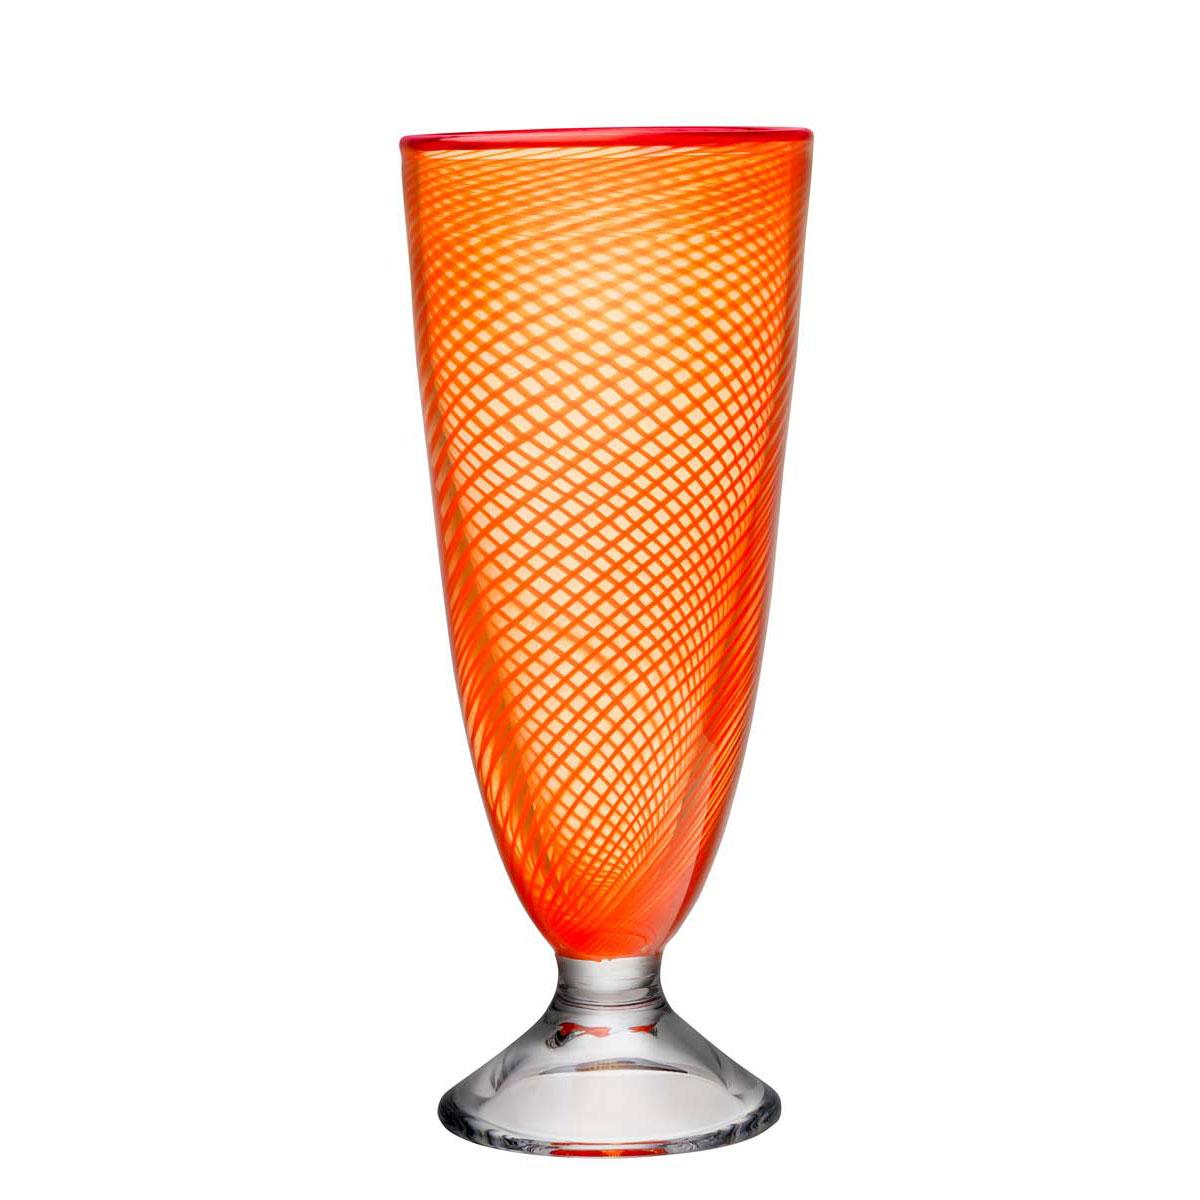 "Kosta Boda Red Rim Orange Footed 10 1/2"" Crystal Vase"